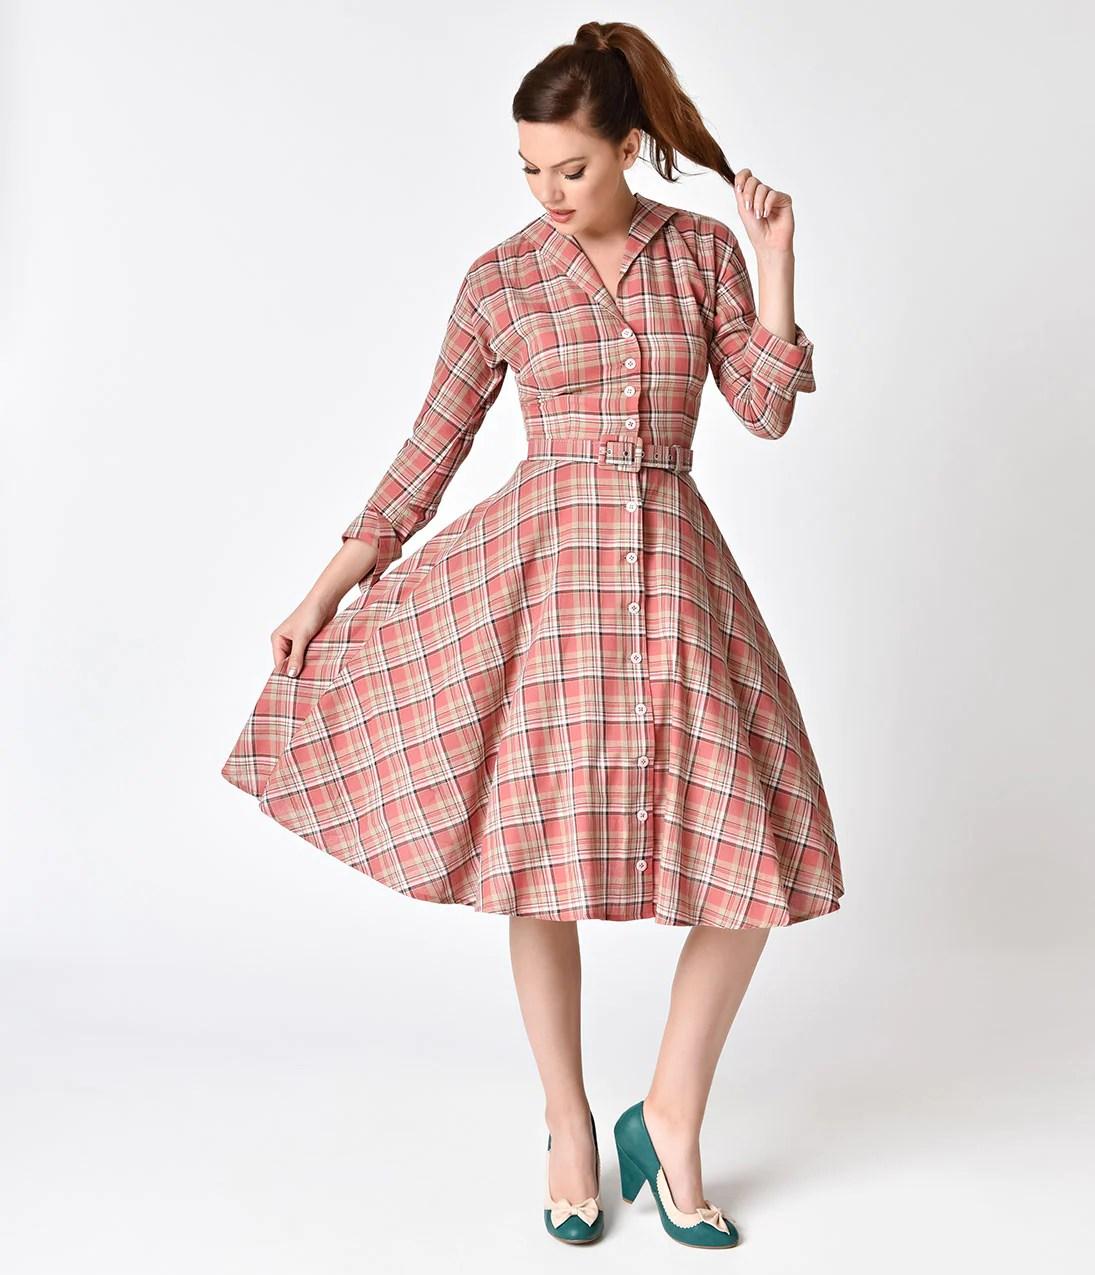 94e16e21e78 ... Shirt Over It 1950s Style Dresses Classic ...